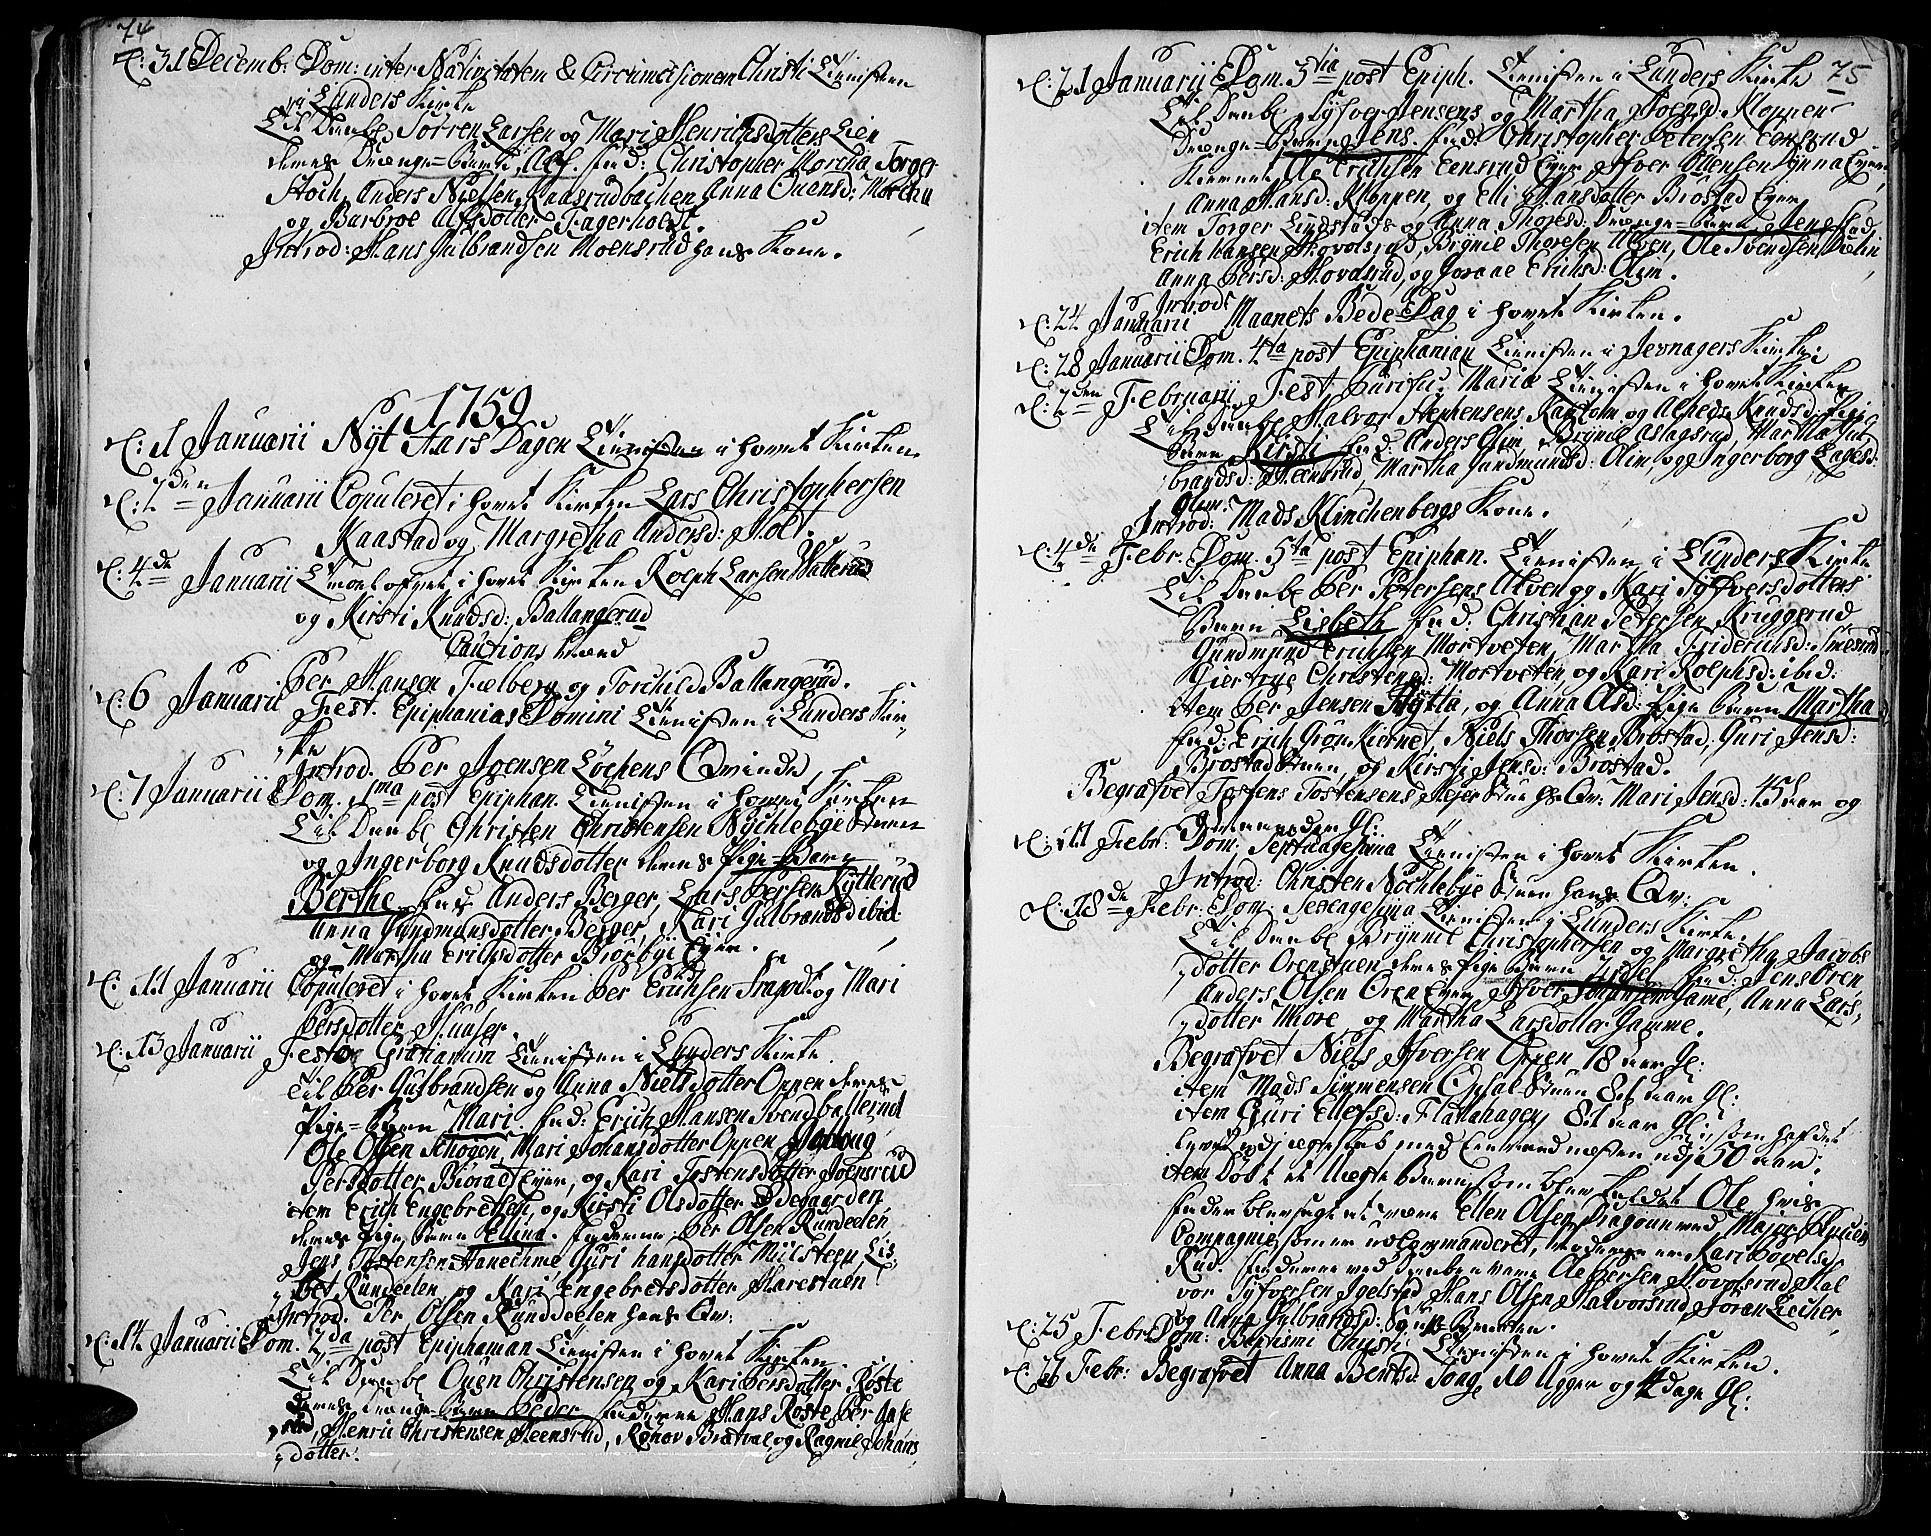 SAH, Jevnaker prestekontor, Ministerialbok nr. 3, 1752-1799, s. 74-75